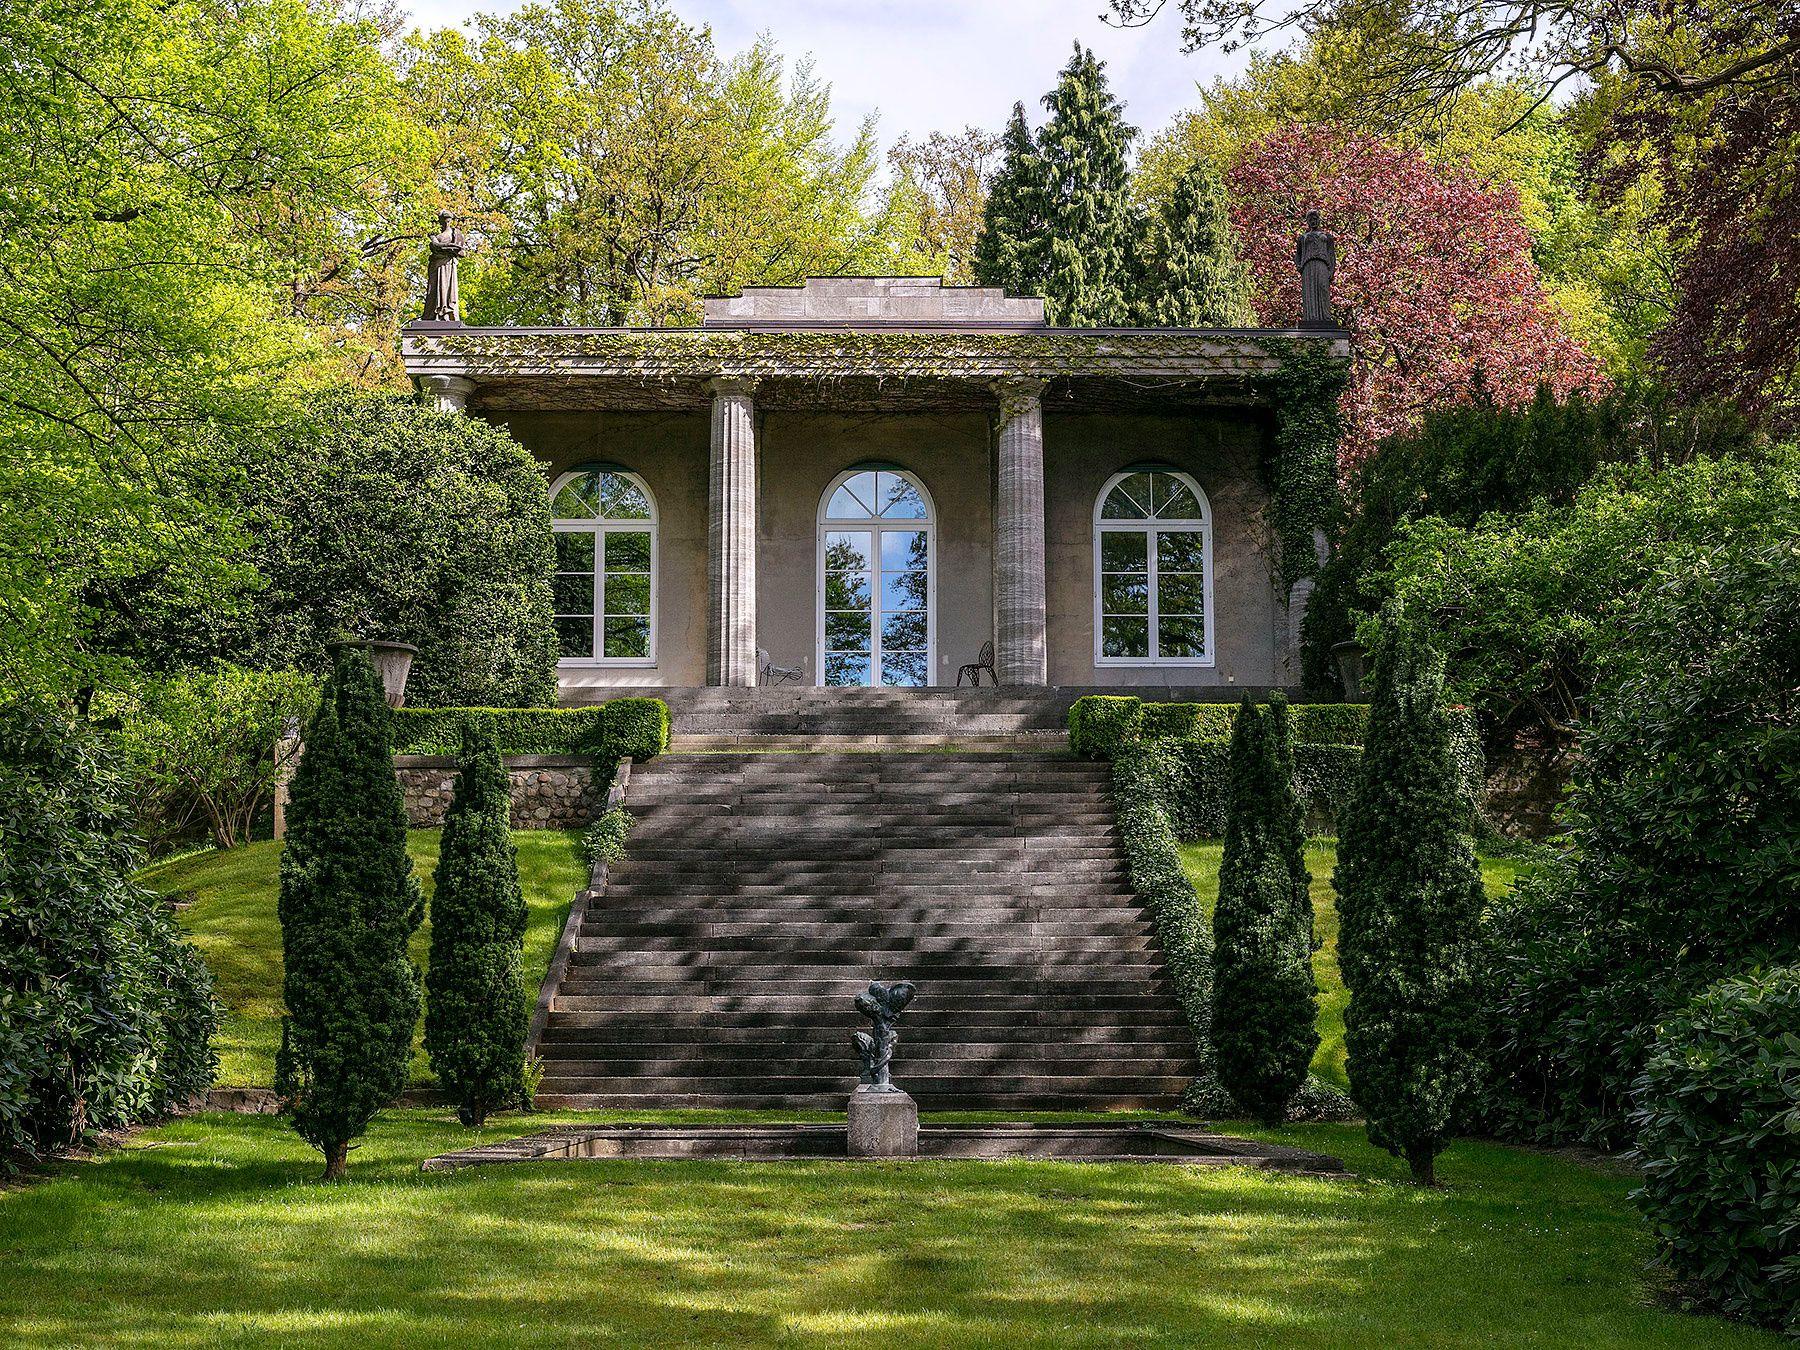 A la venta casa Karl Lagerfeld en Hamburgo por 10 millones